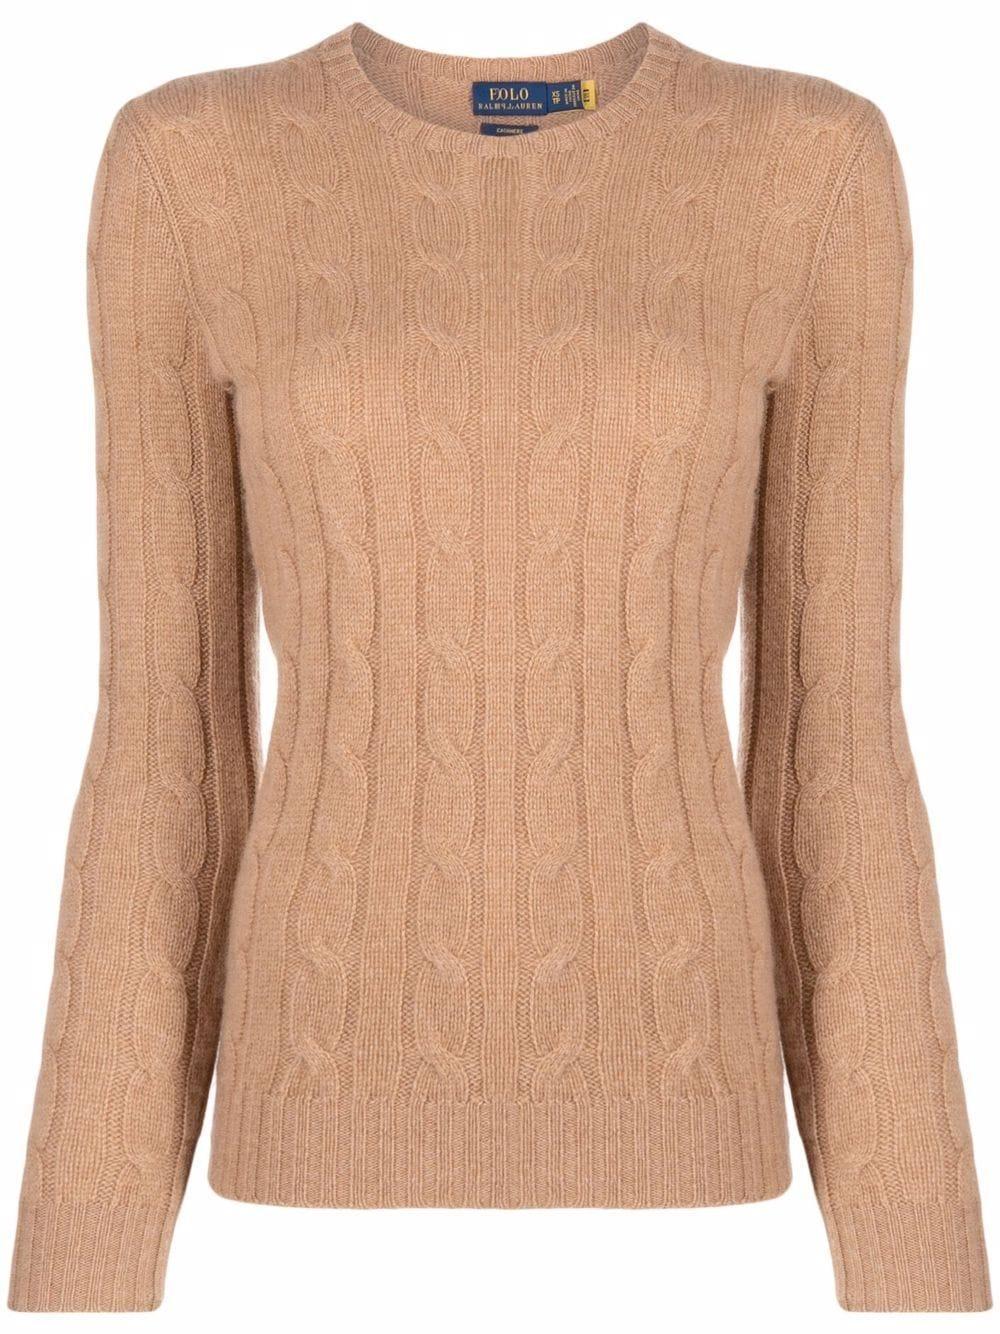 Julianna Classic Sweater Item # 211780379025